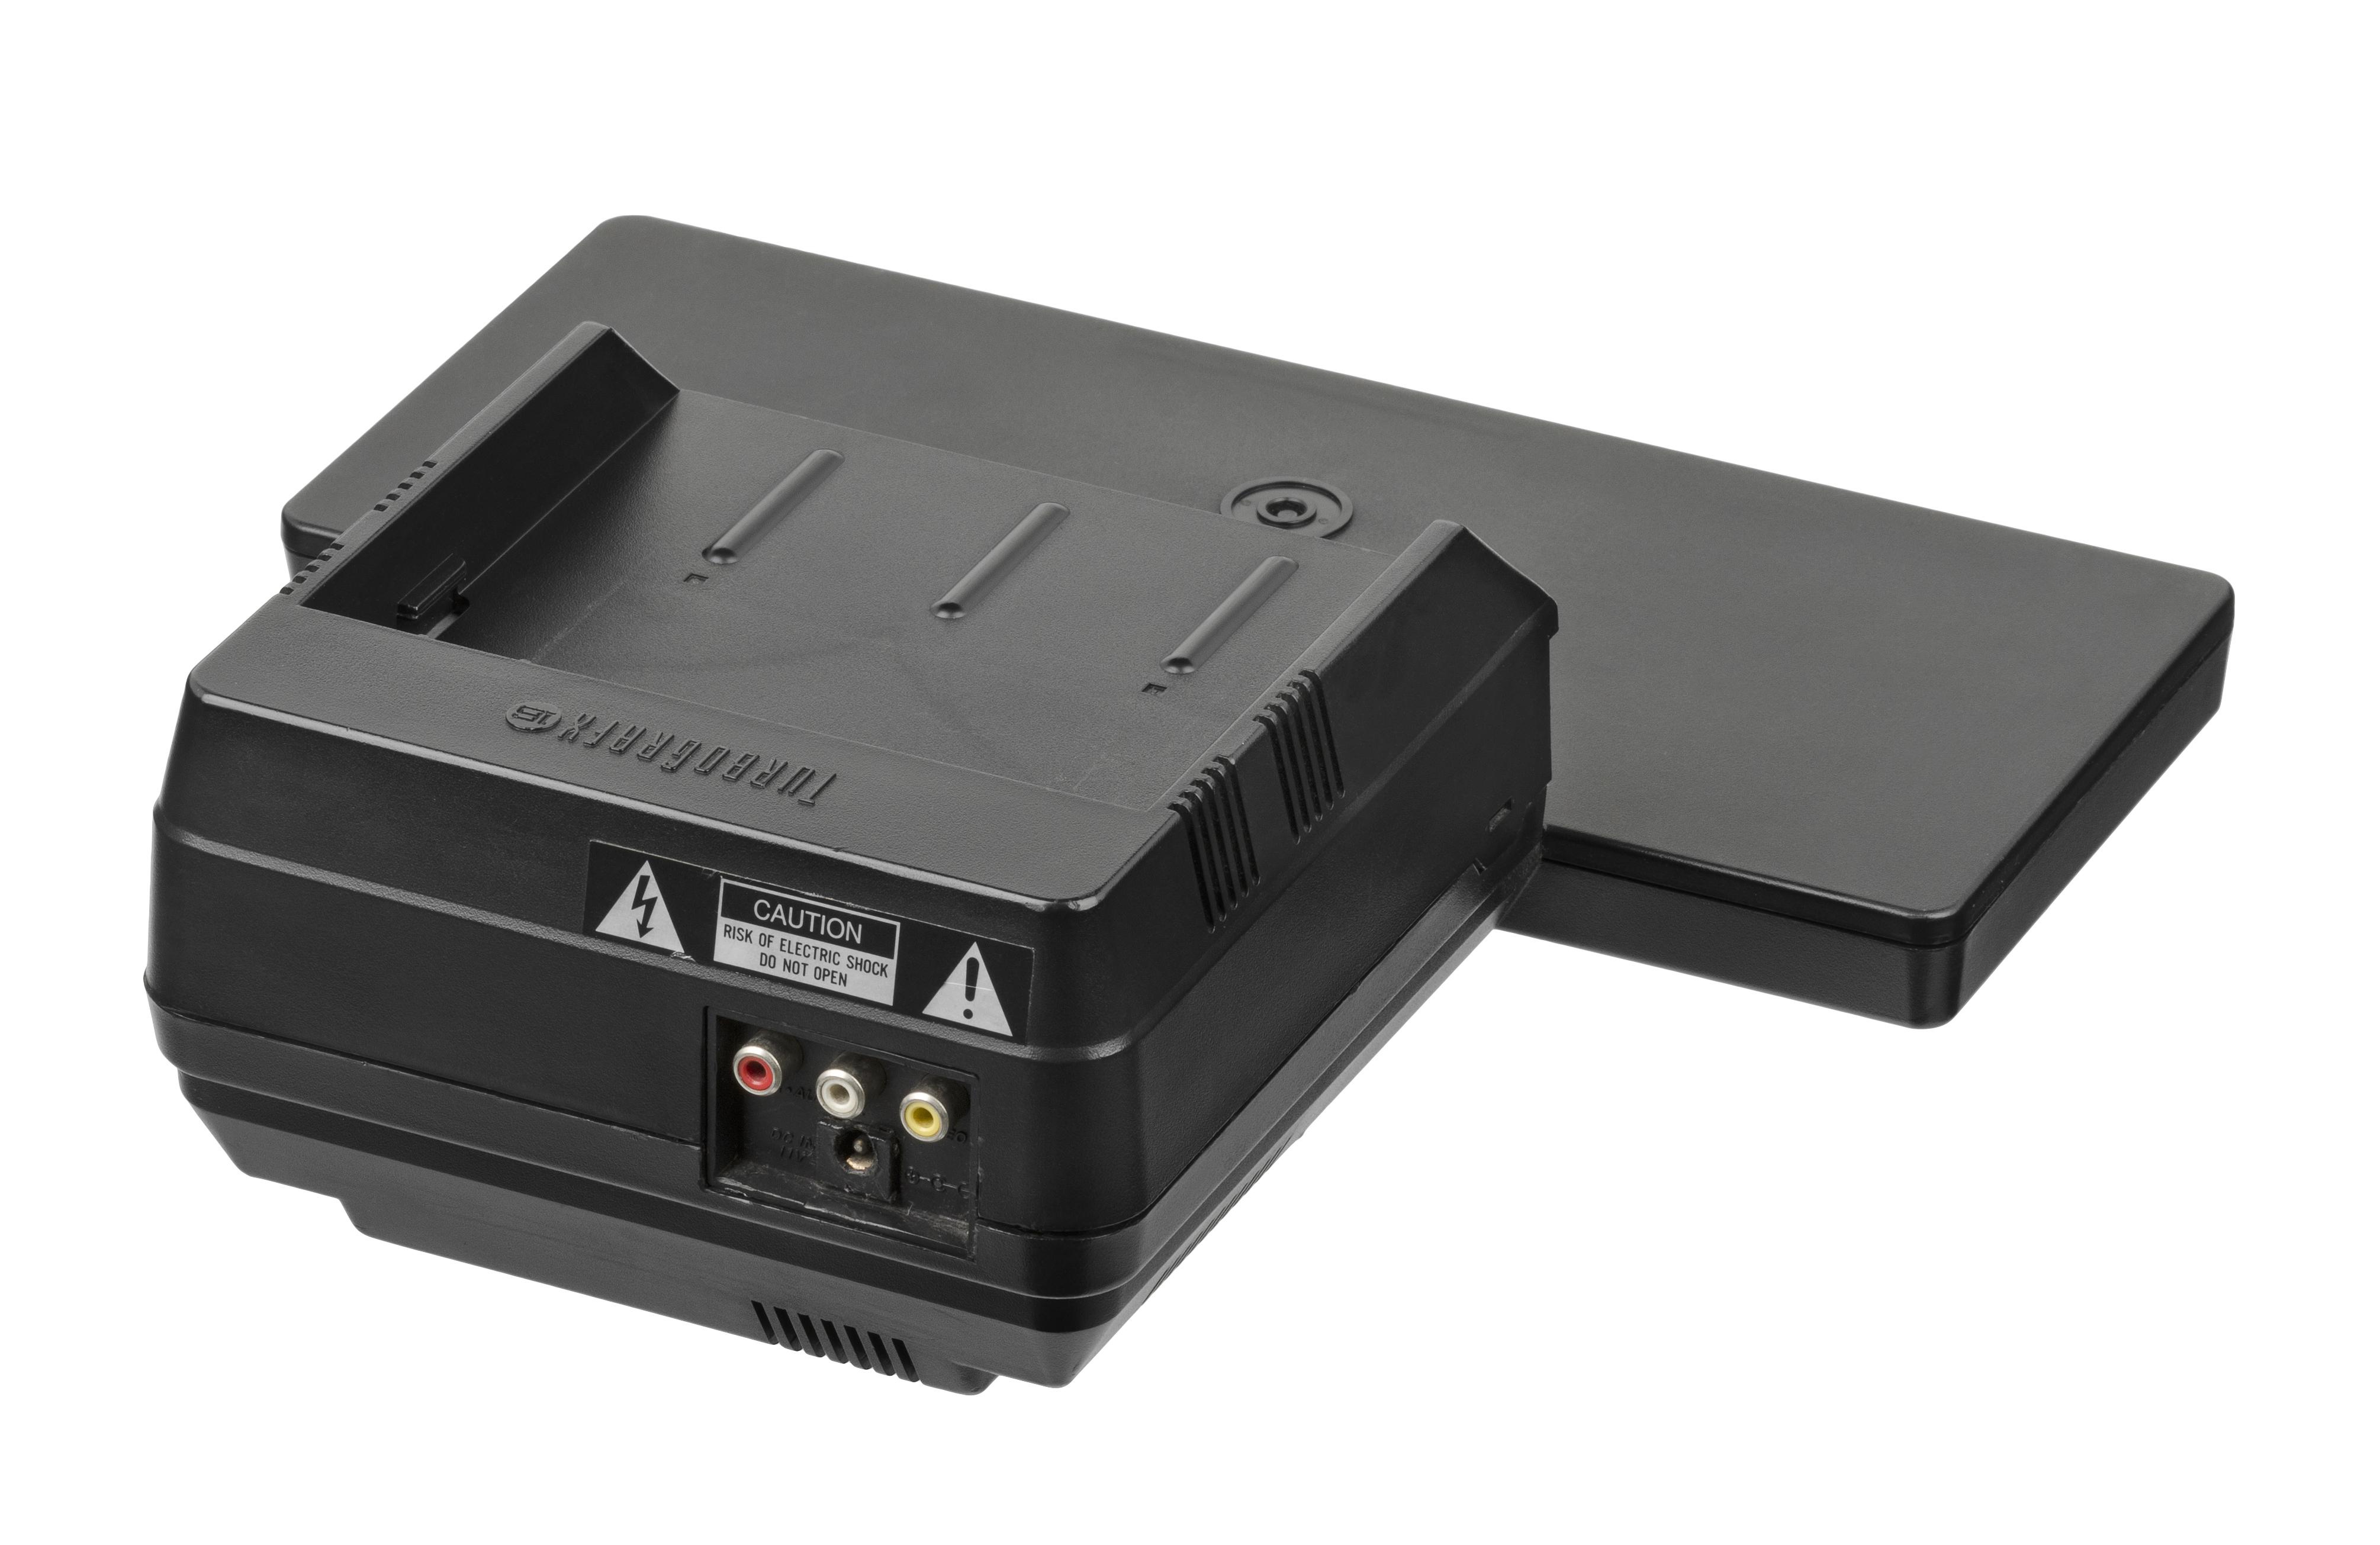 File:NEC-TurboGrafx-16-CD-BR-Base jpg - Wikimedia Commons